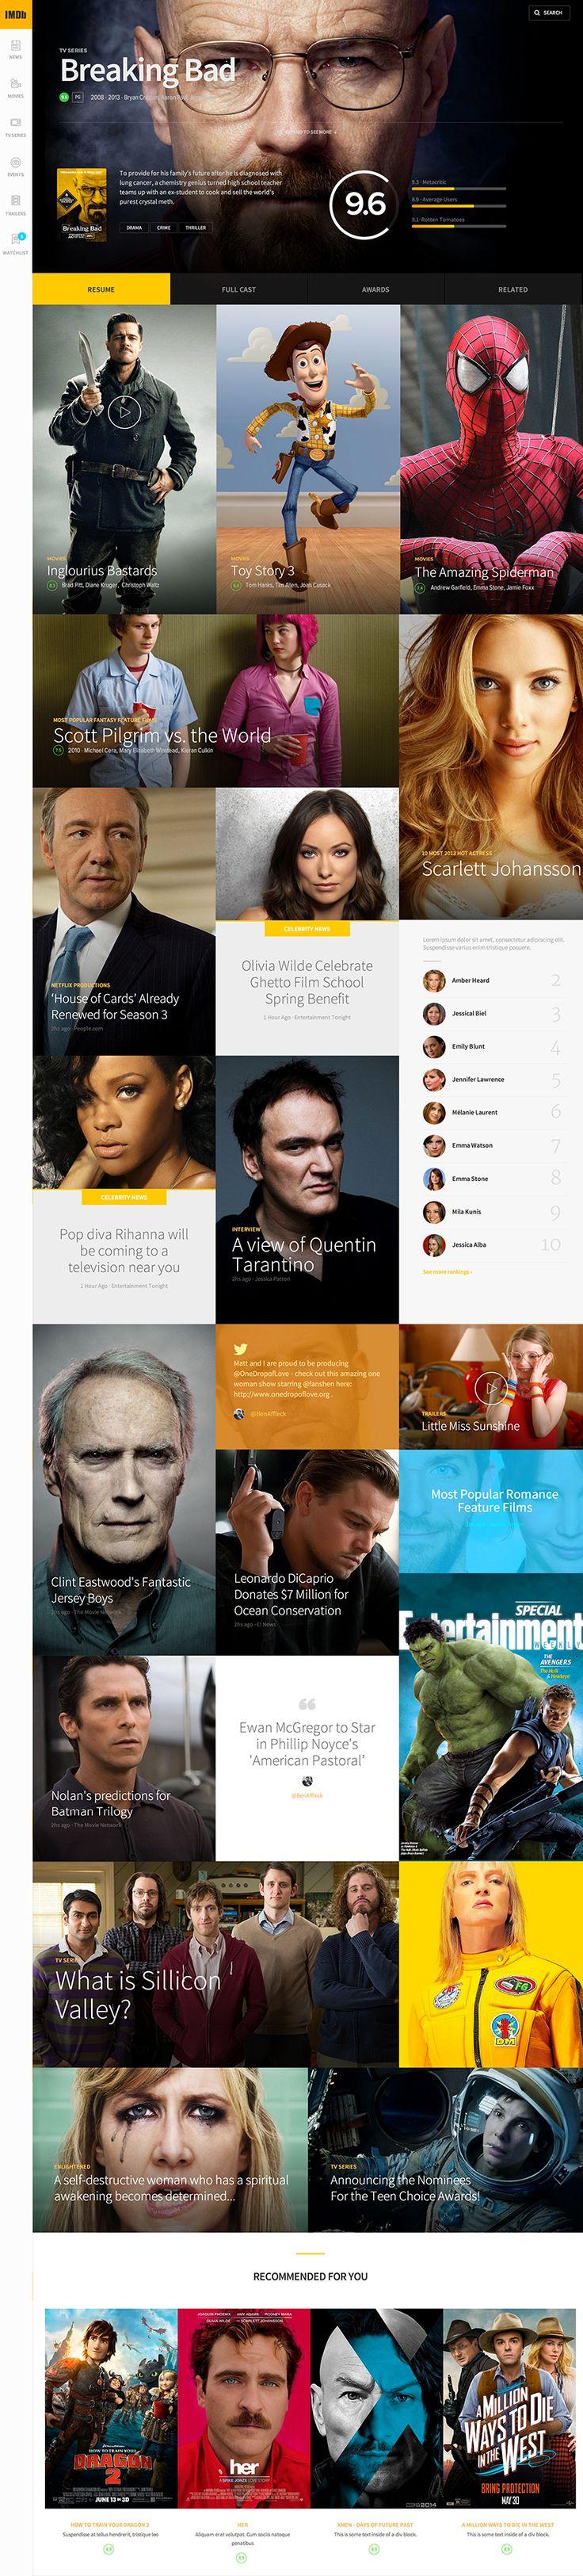 Concept Design for IMDb | Abduzeedo Design Inspiration